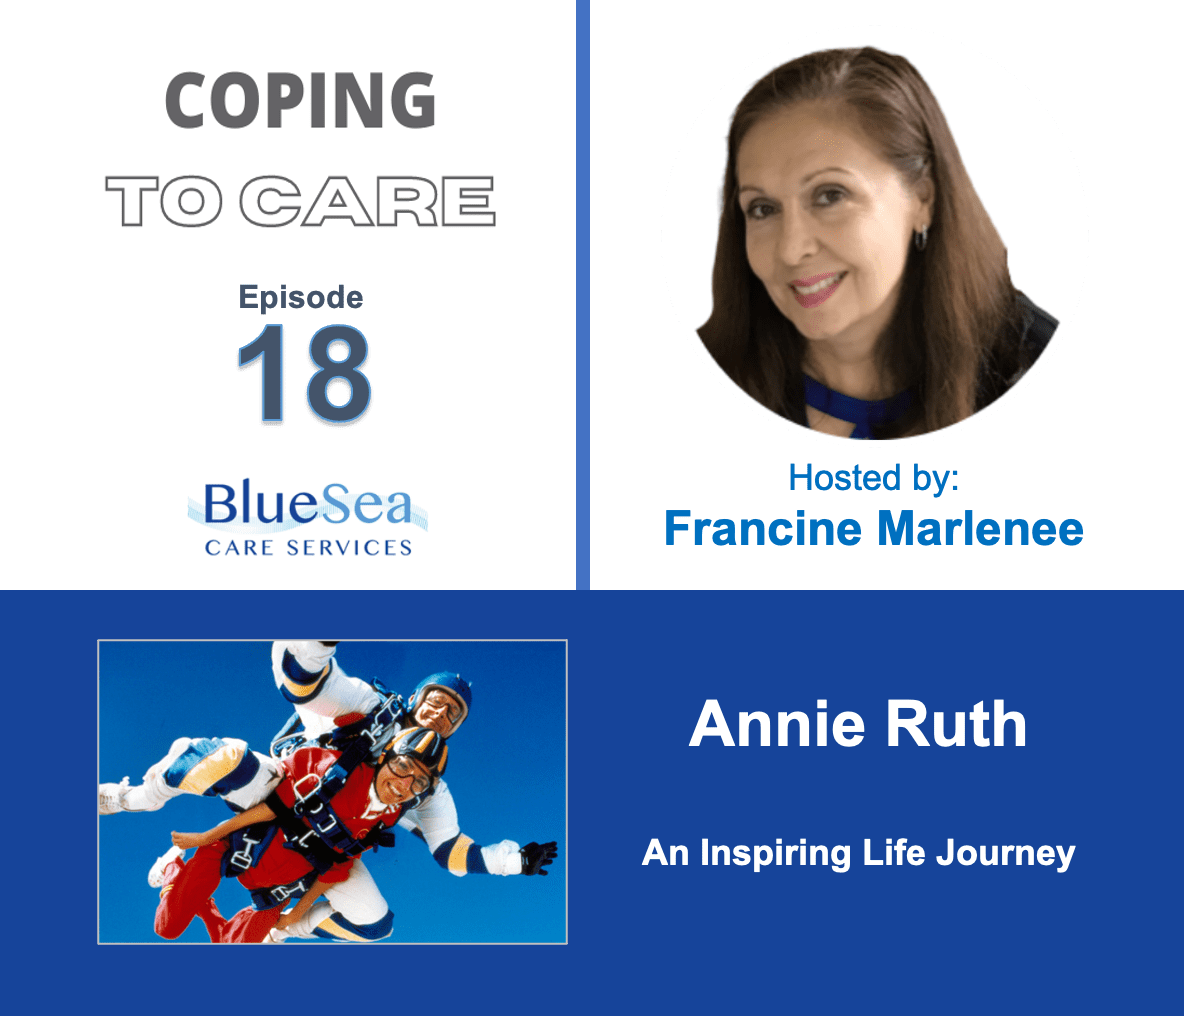 Annie Ruth: An Inspiring Life Journey